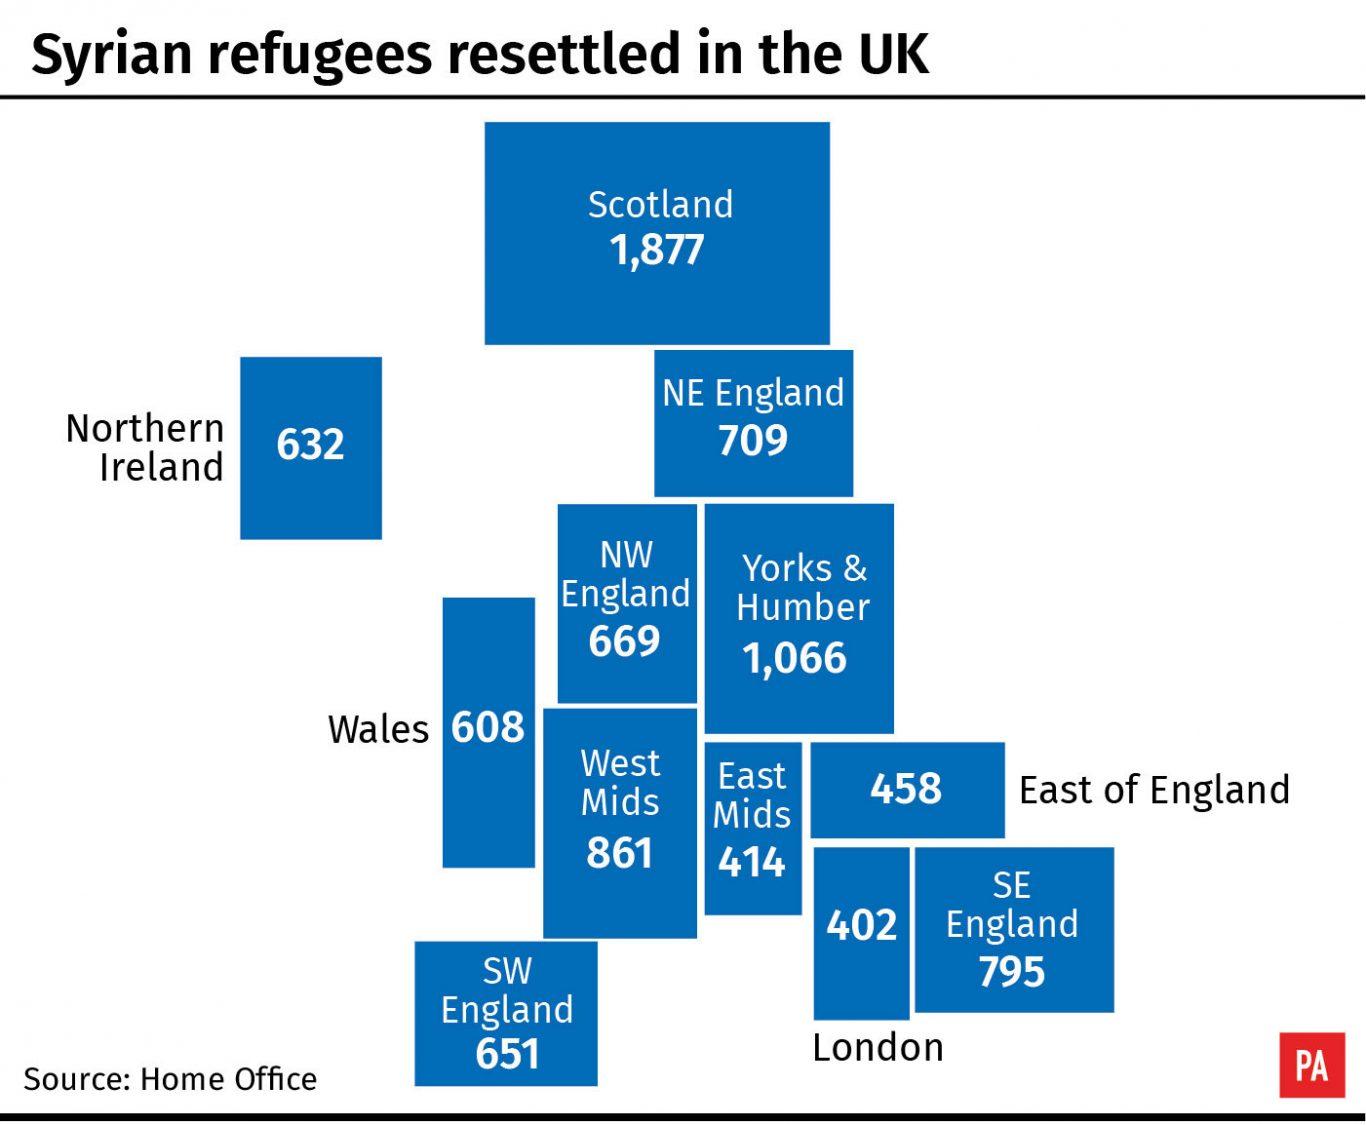 Syrian refugees resettled in the UK